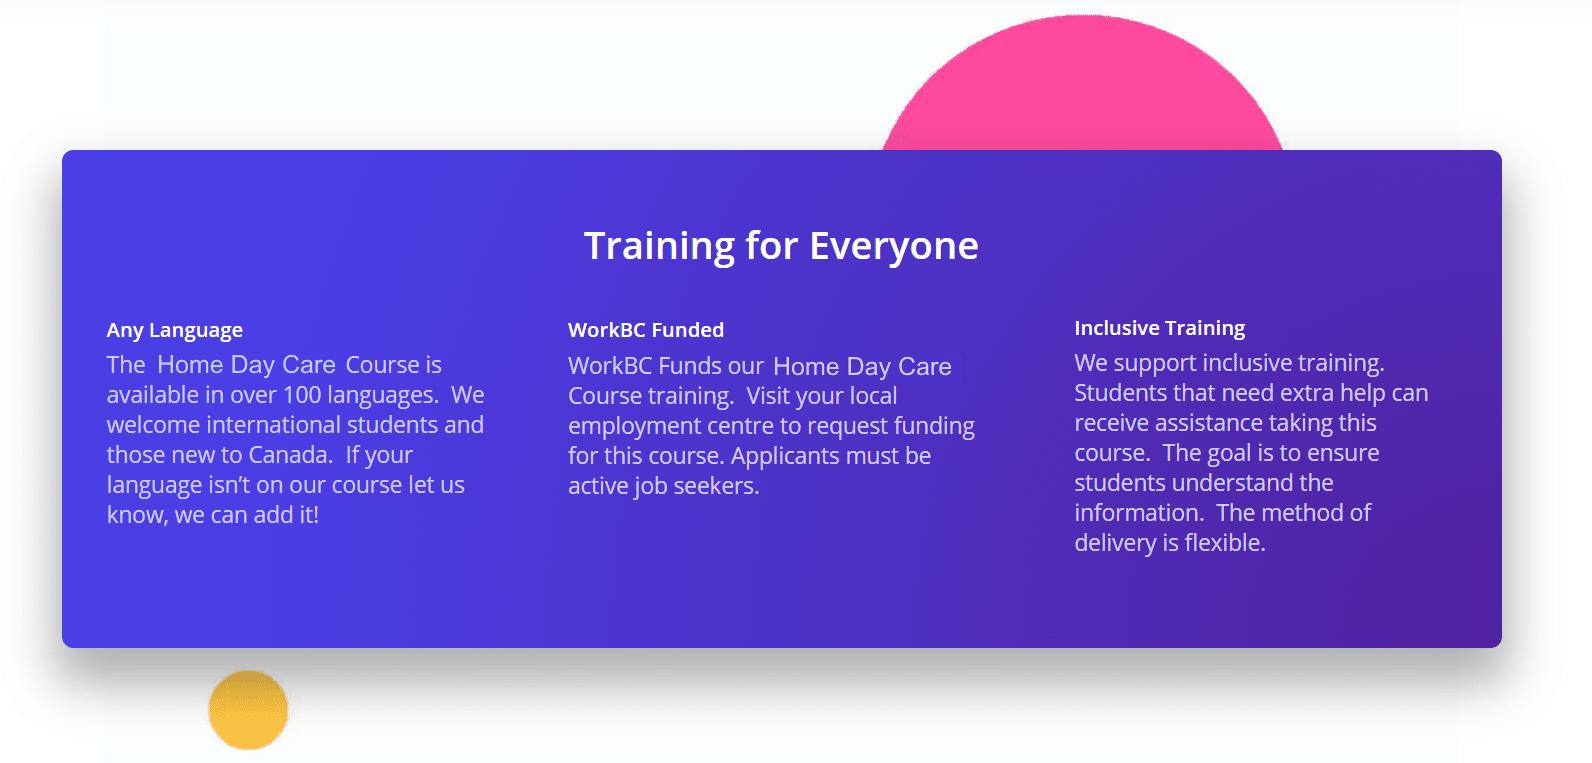 Inclusive Training Head Start Online School